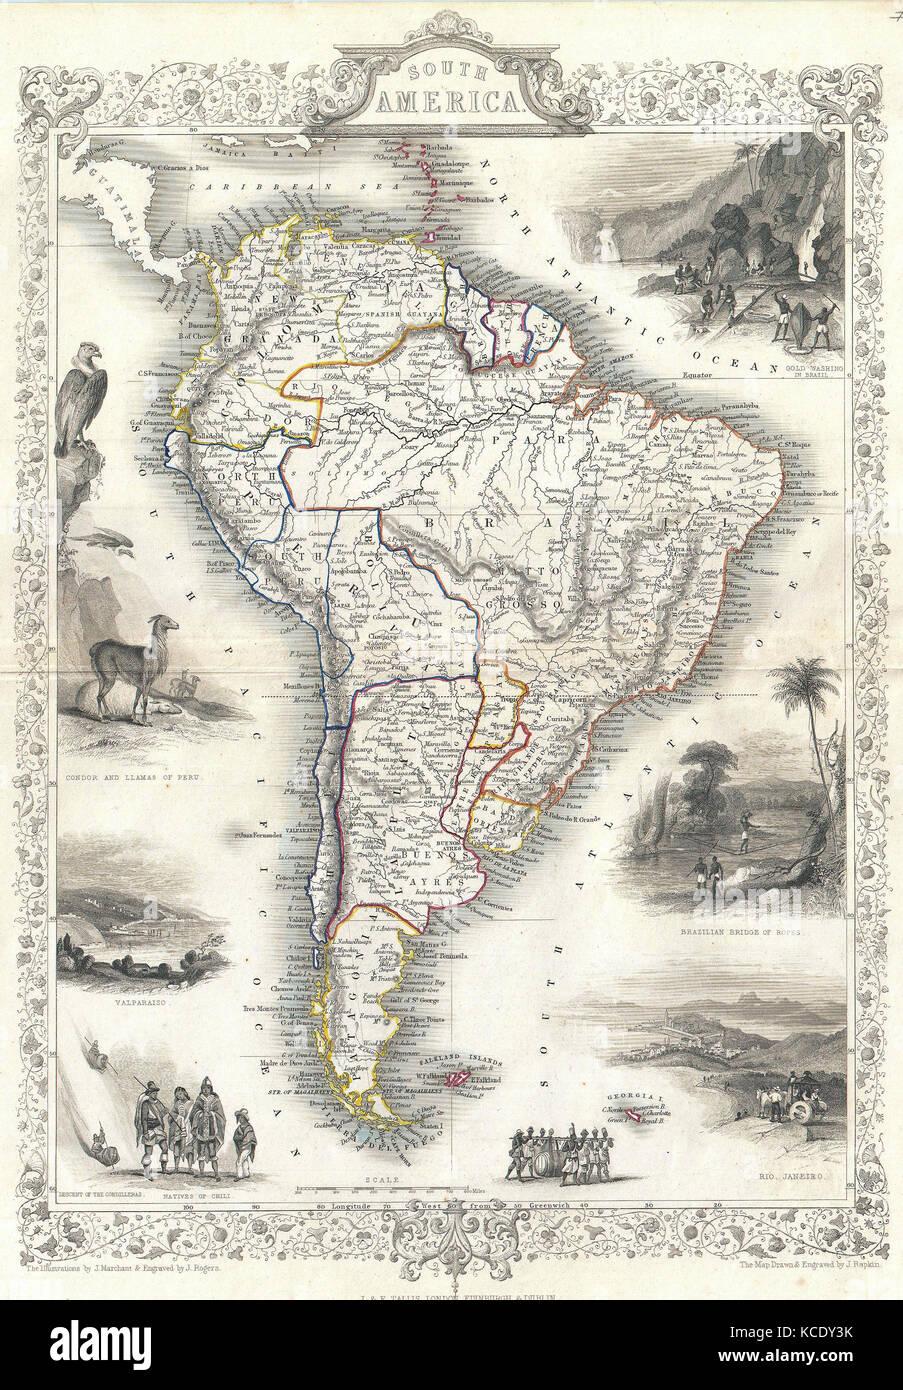 1850, Tallis Map of South America - Stock Image